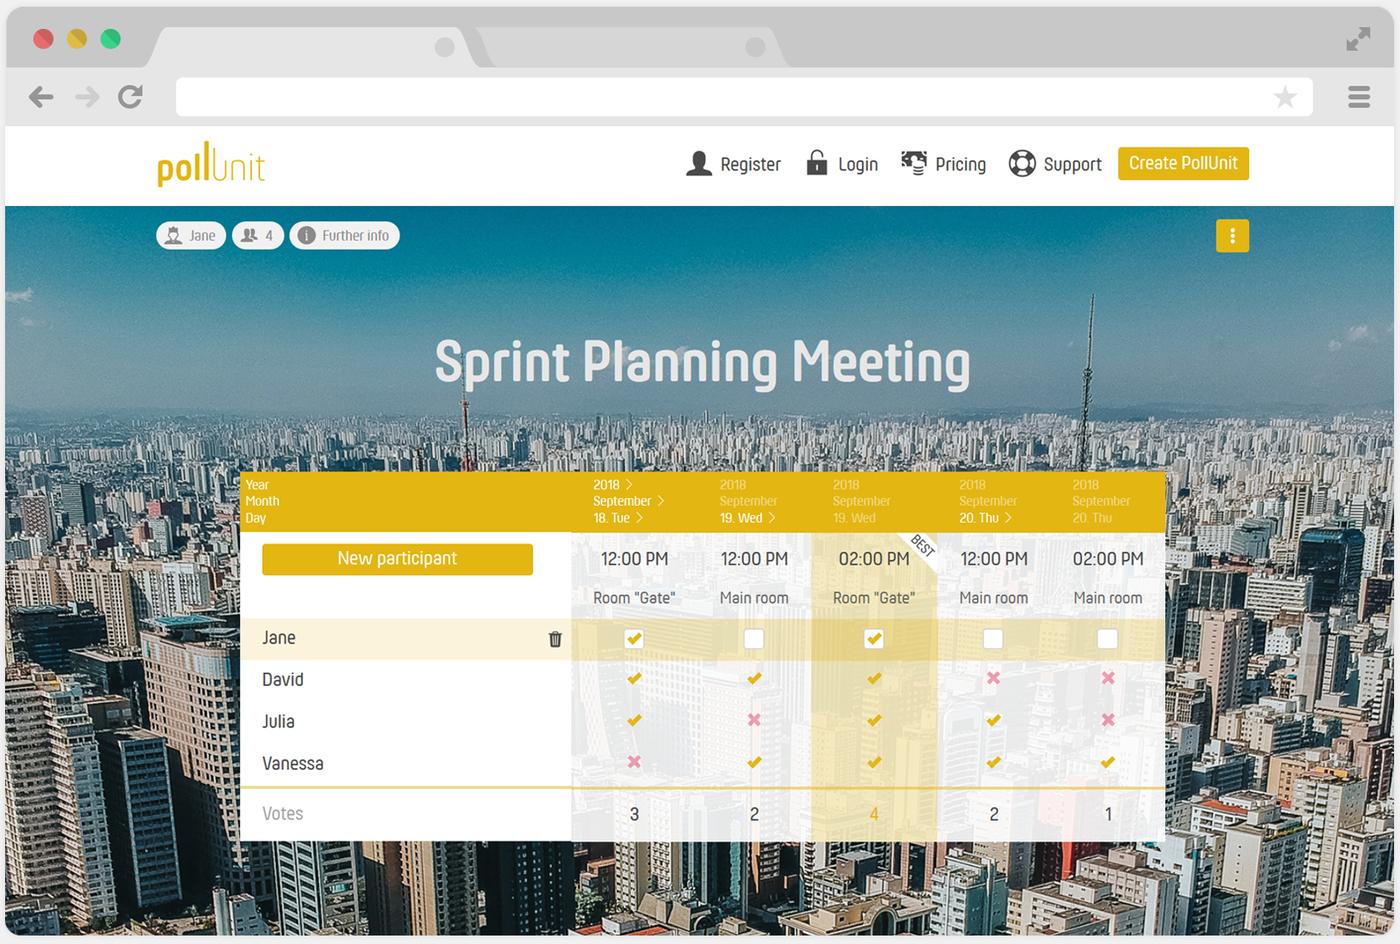 Schedule meetings, activities and events